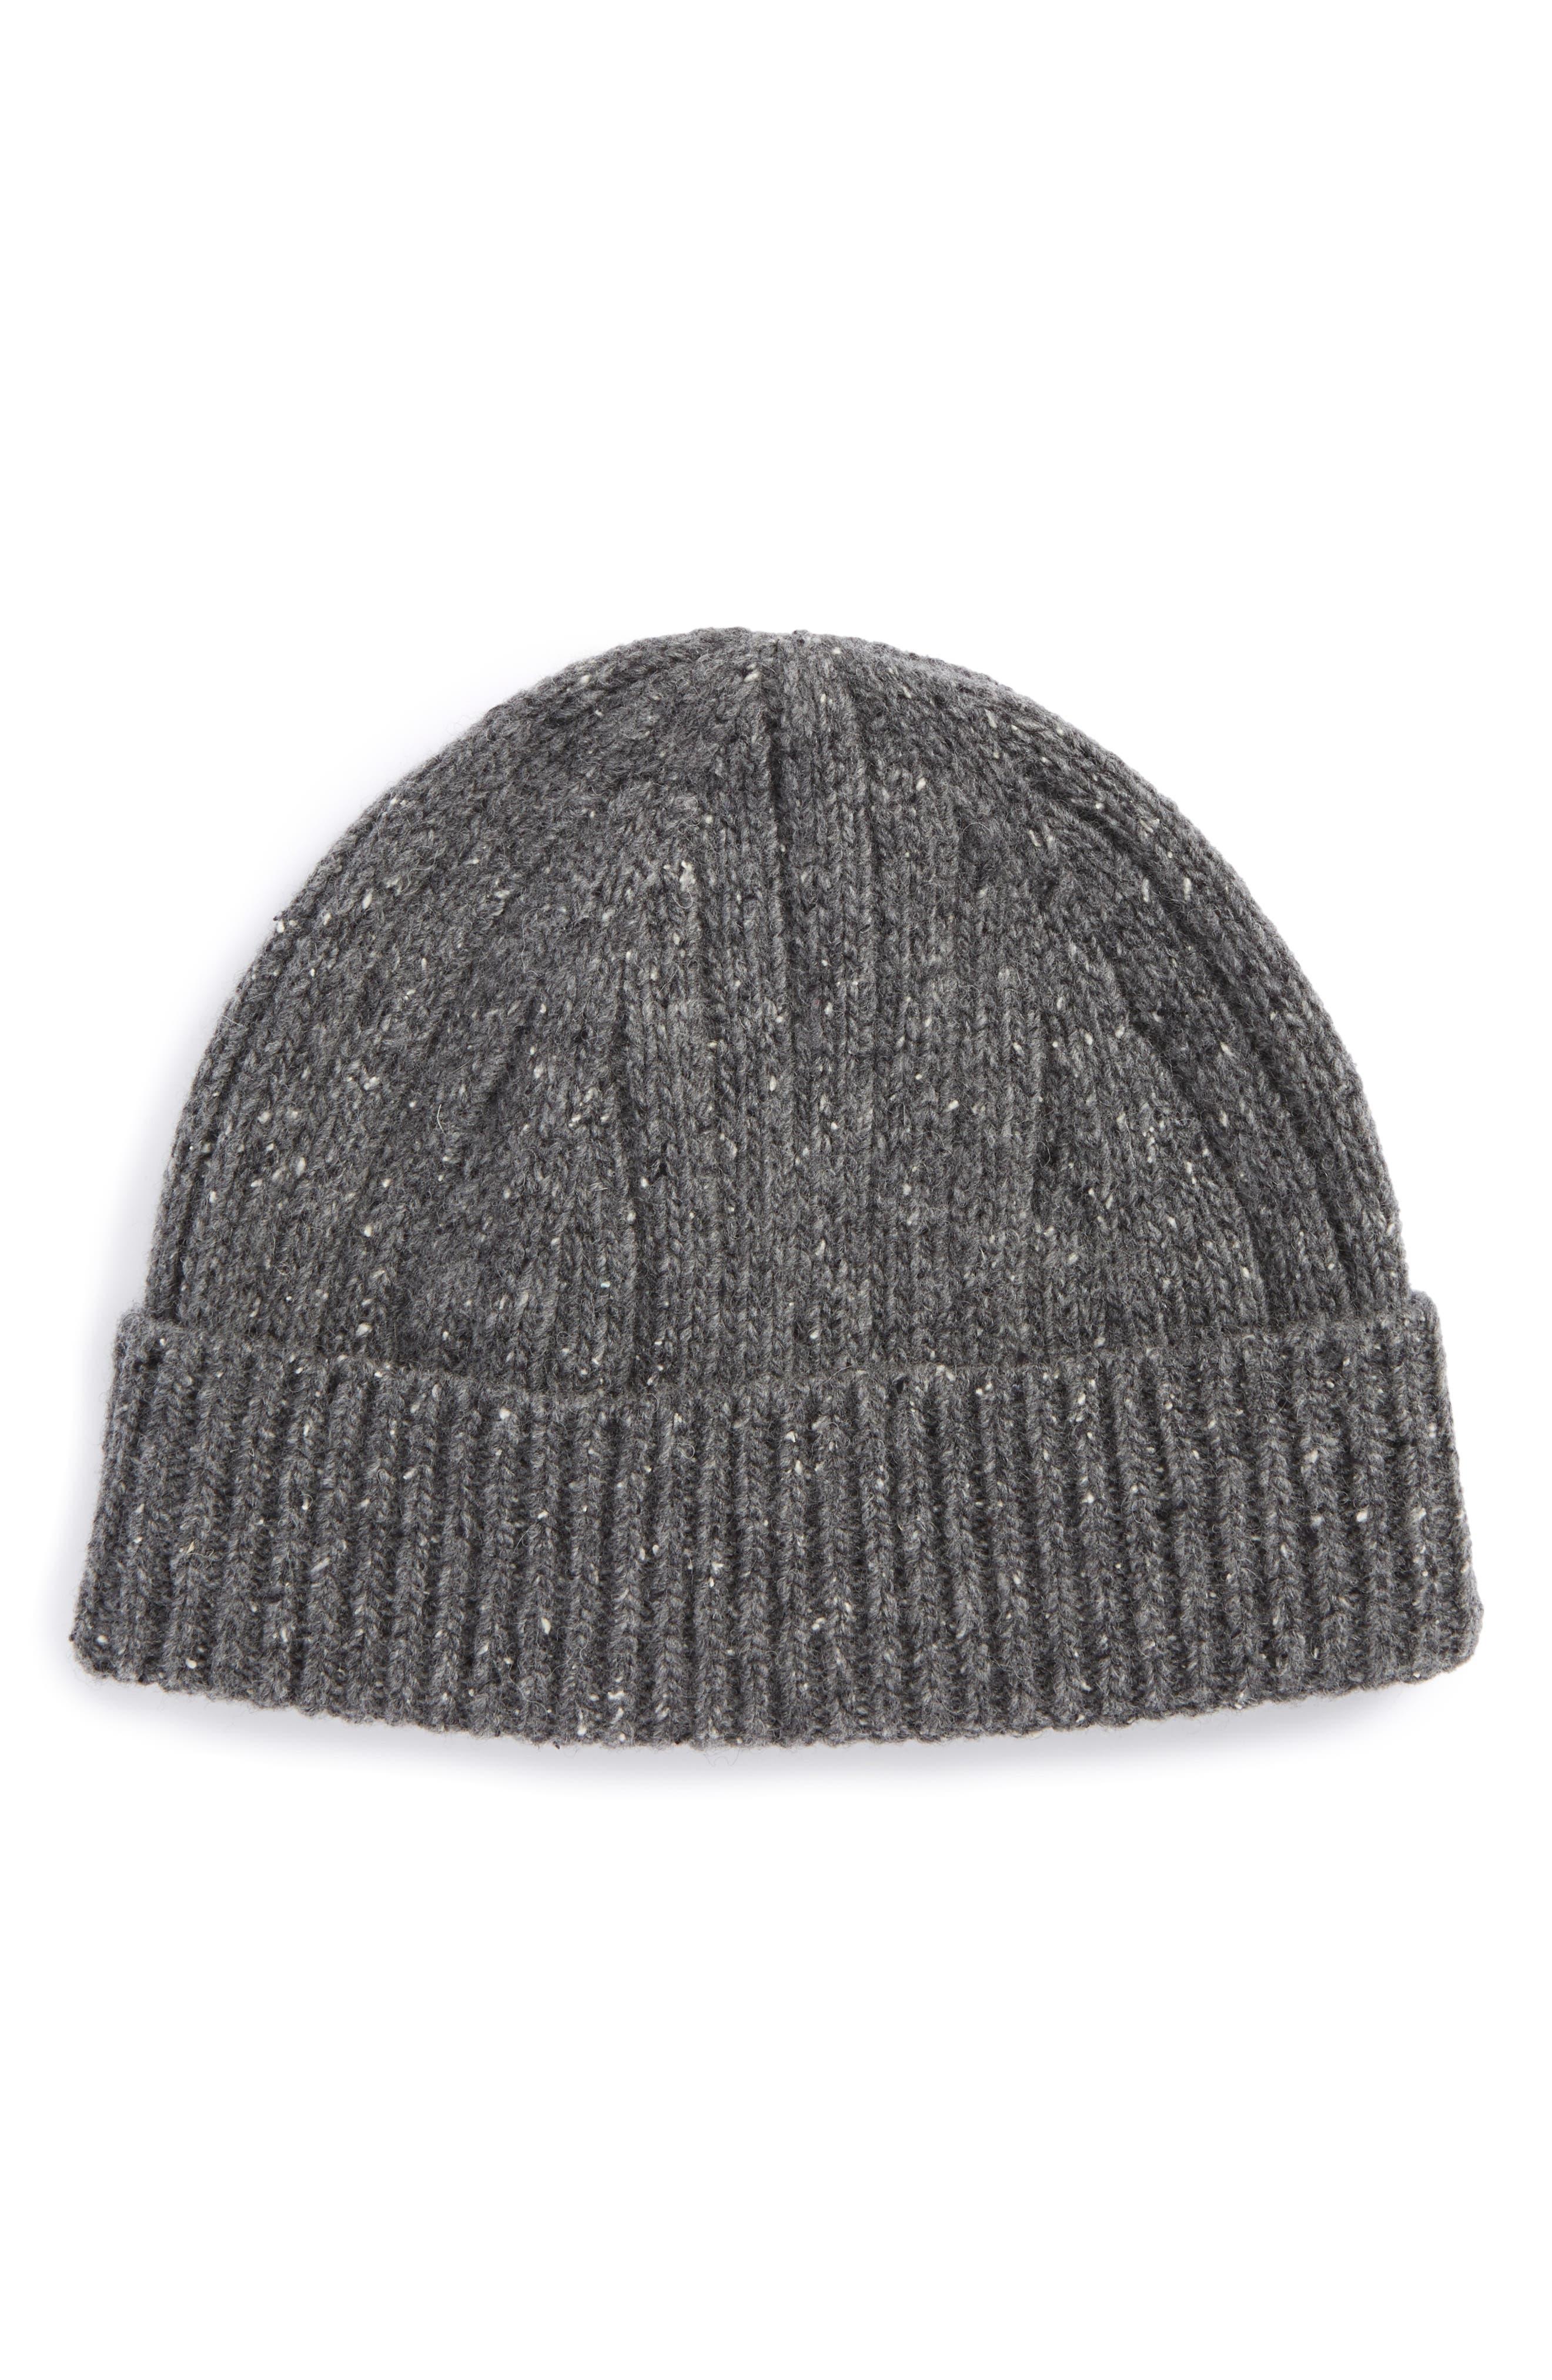 Wool Blend Beanie,                         Main,                         color, 002